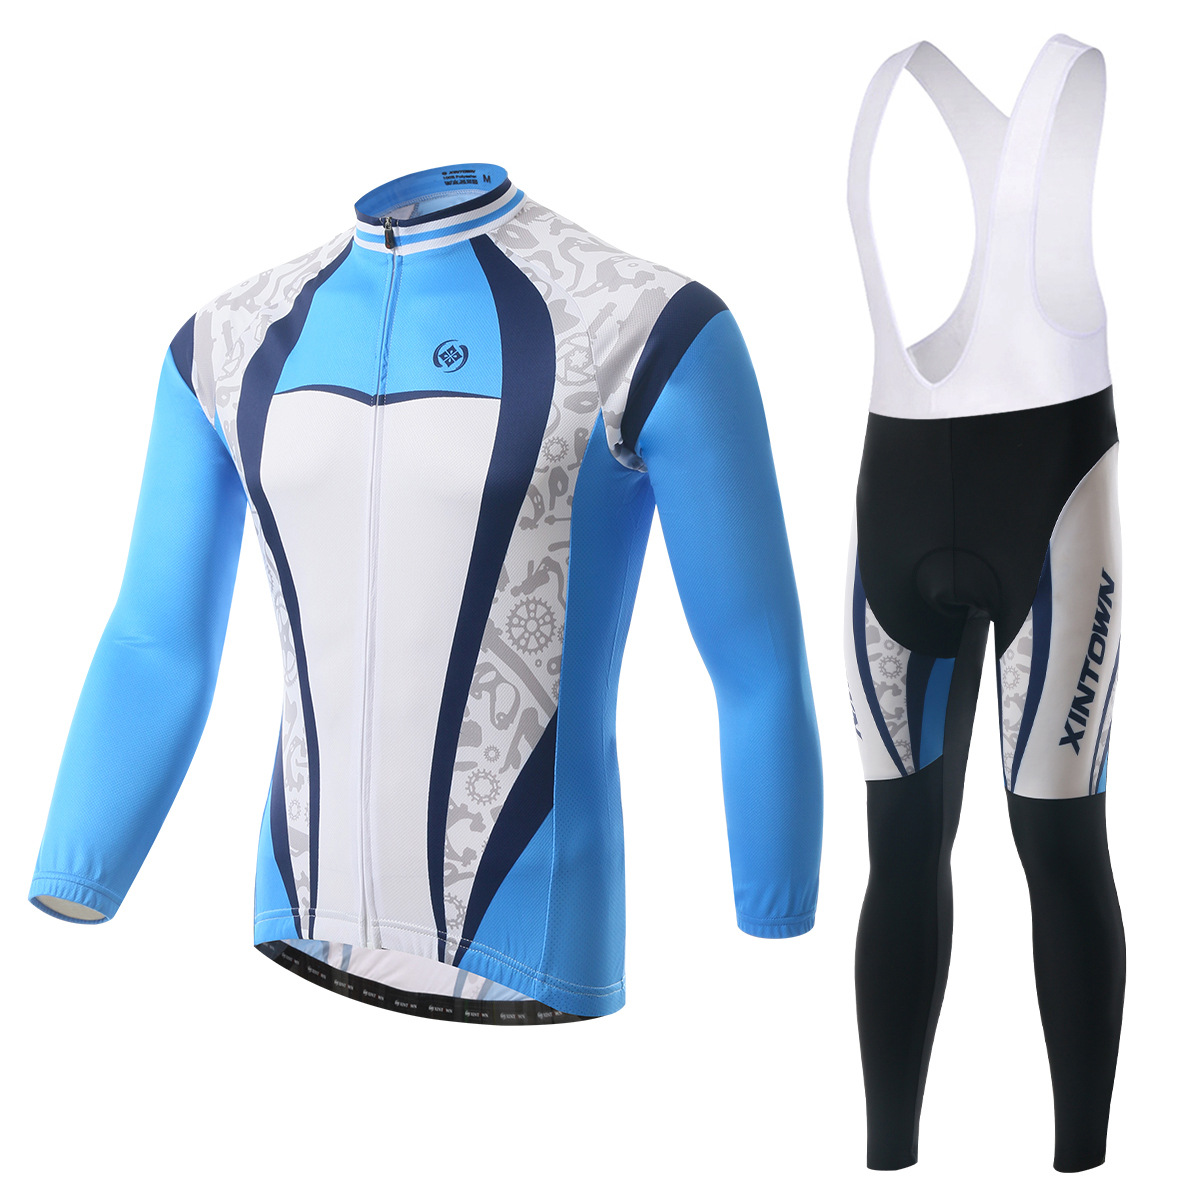 XINTOWN blueprint bike riding jersey gear strap long-sleeved suit wear bicycle suits fleece wind warm features underwear